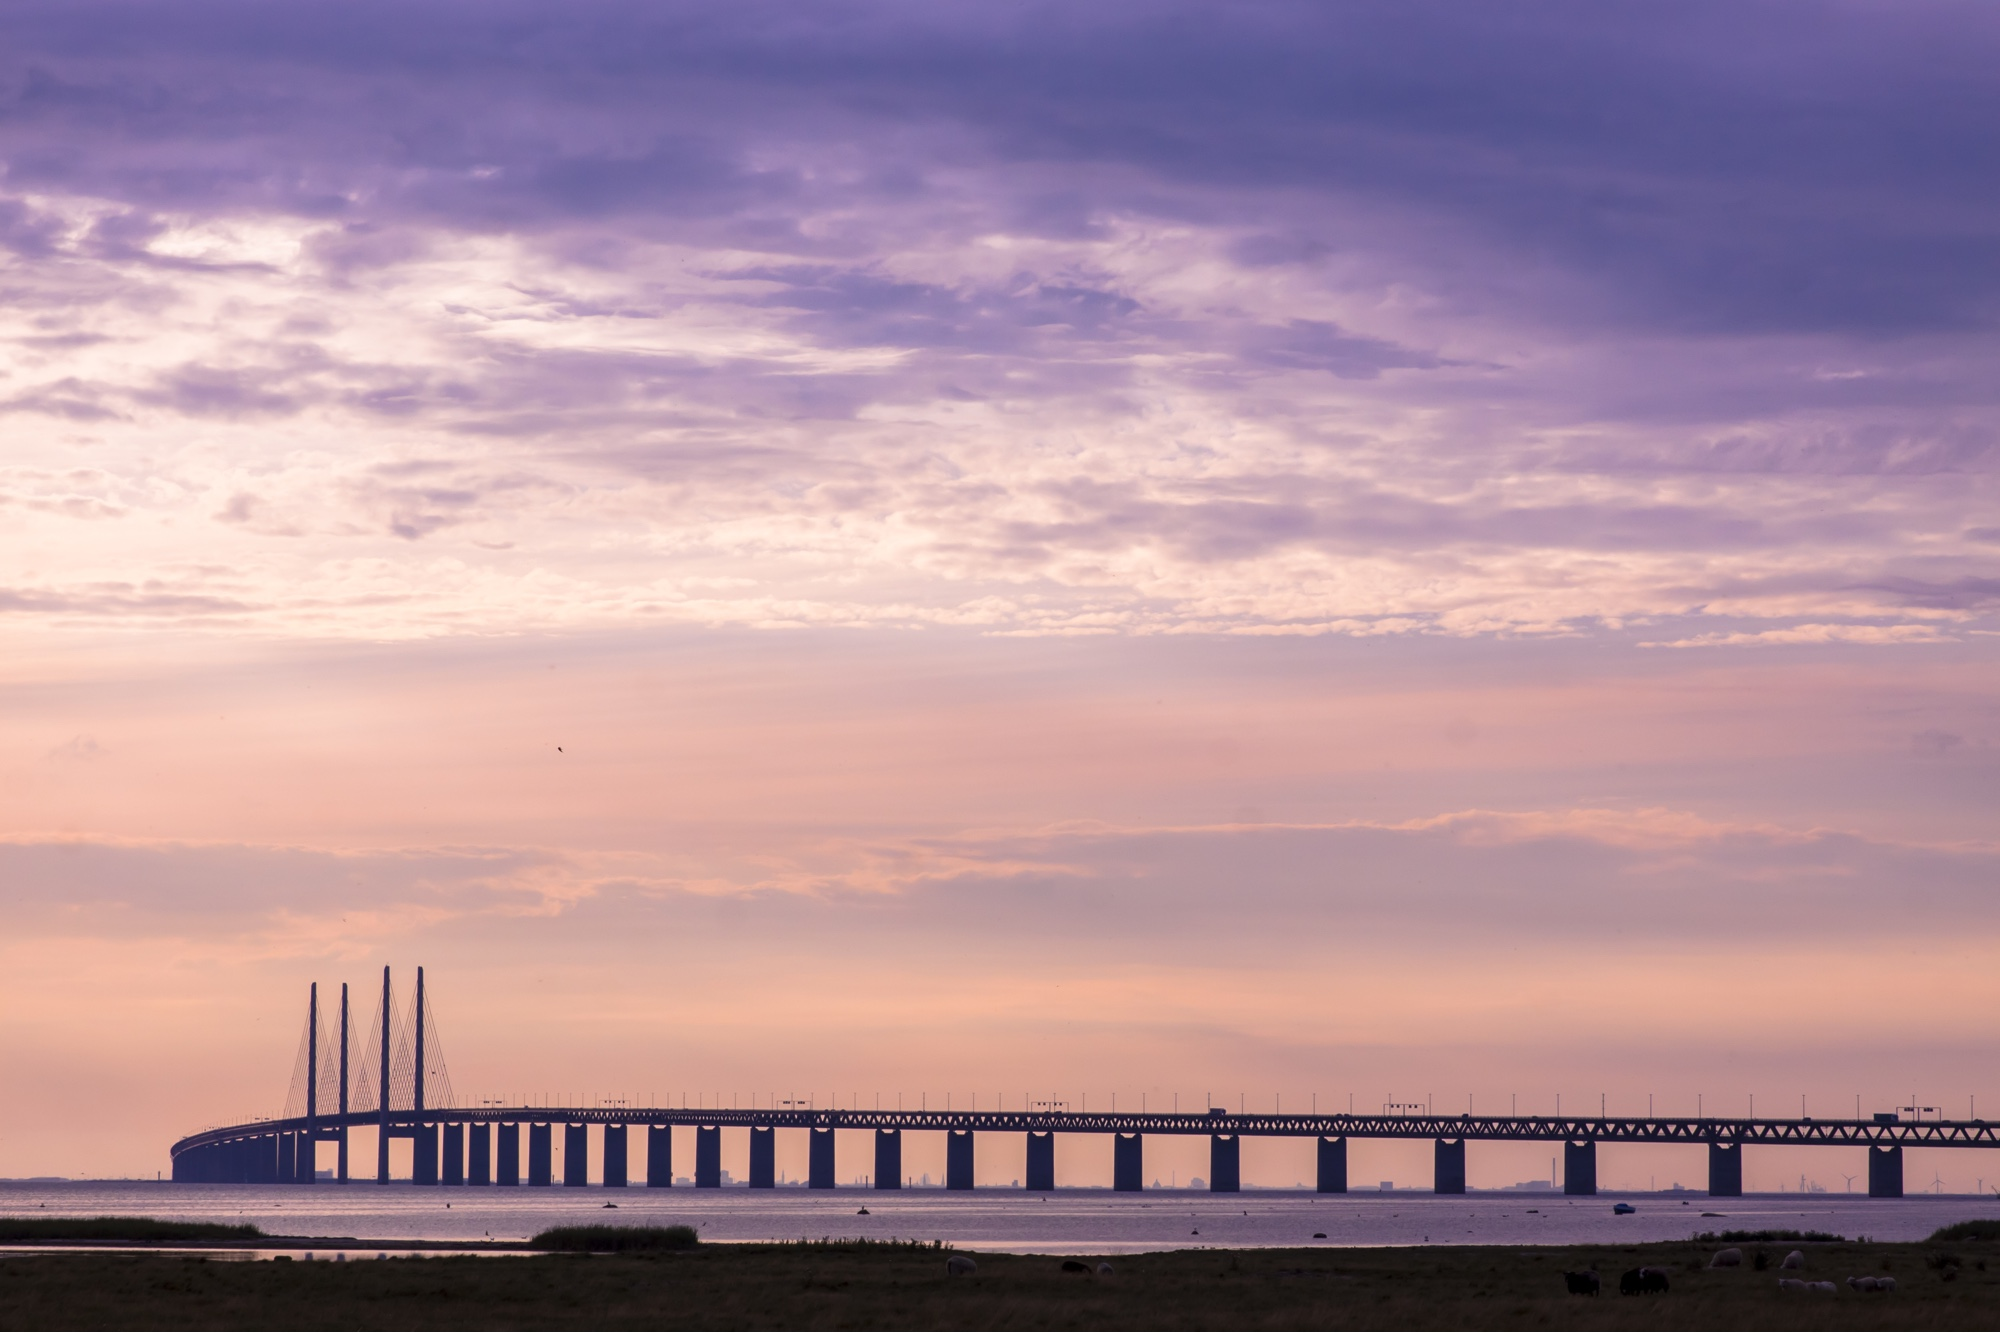 Oresundsbron. The bridge from Copenhagen to Malmo